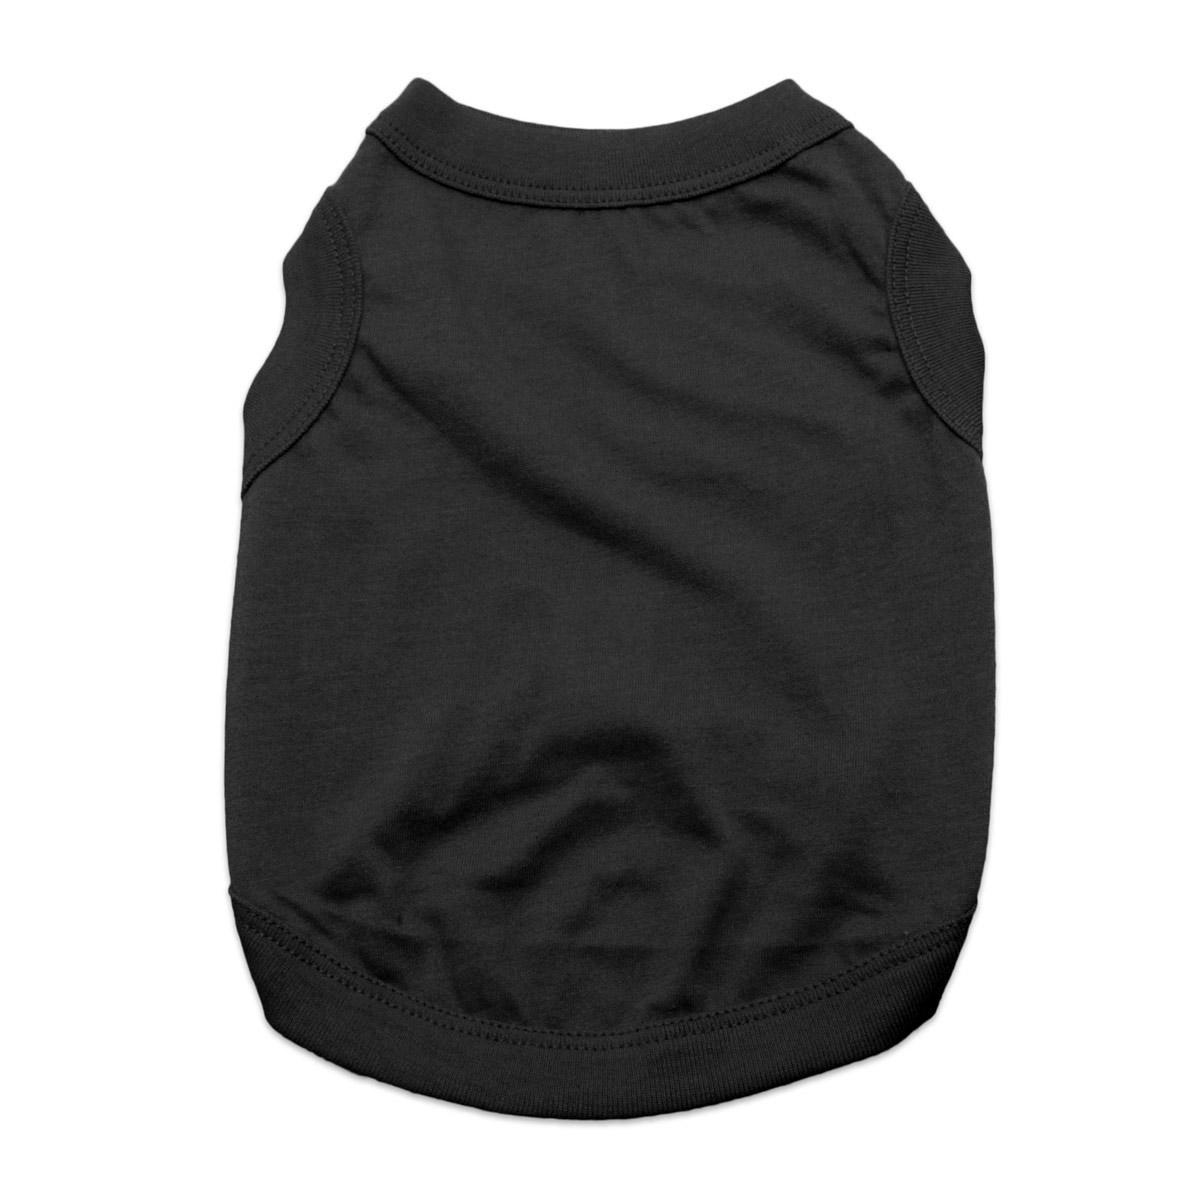 Barking Basics Dog Tank Shirt - Black